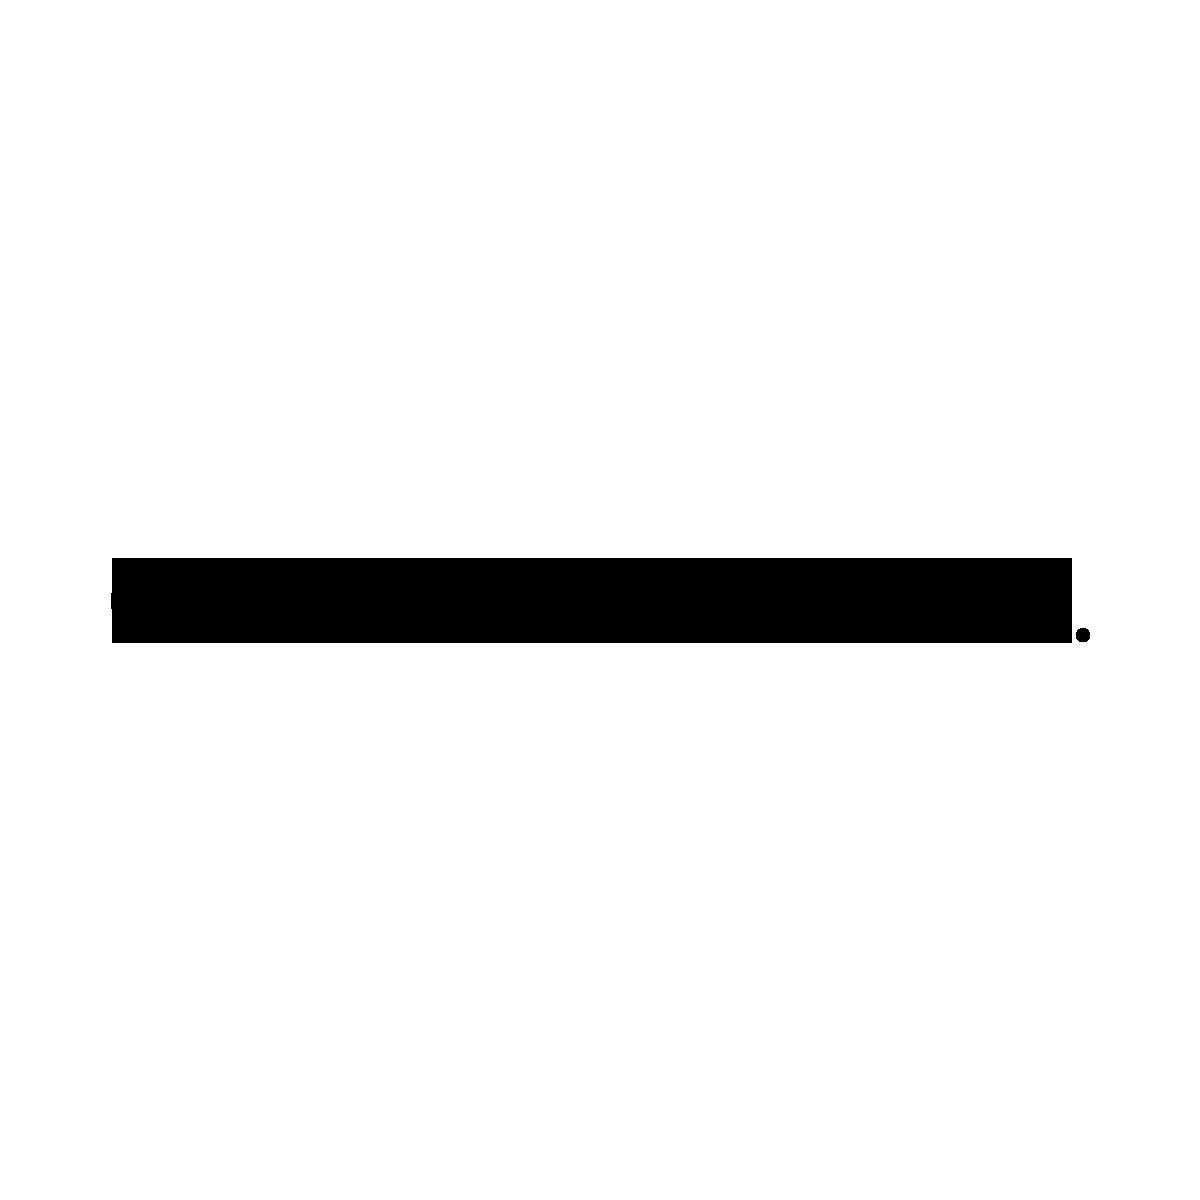 Weißer-Sneaker-Glattleder-mit-Neoprensocke-Olive